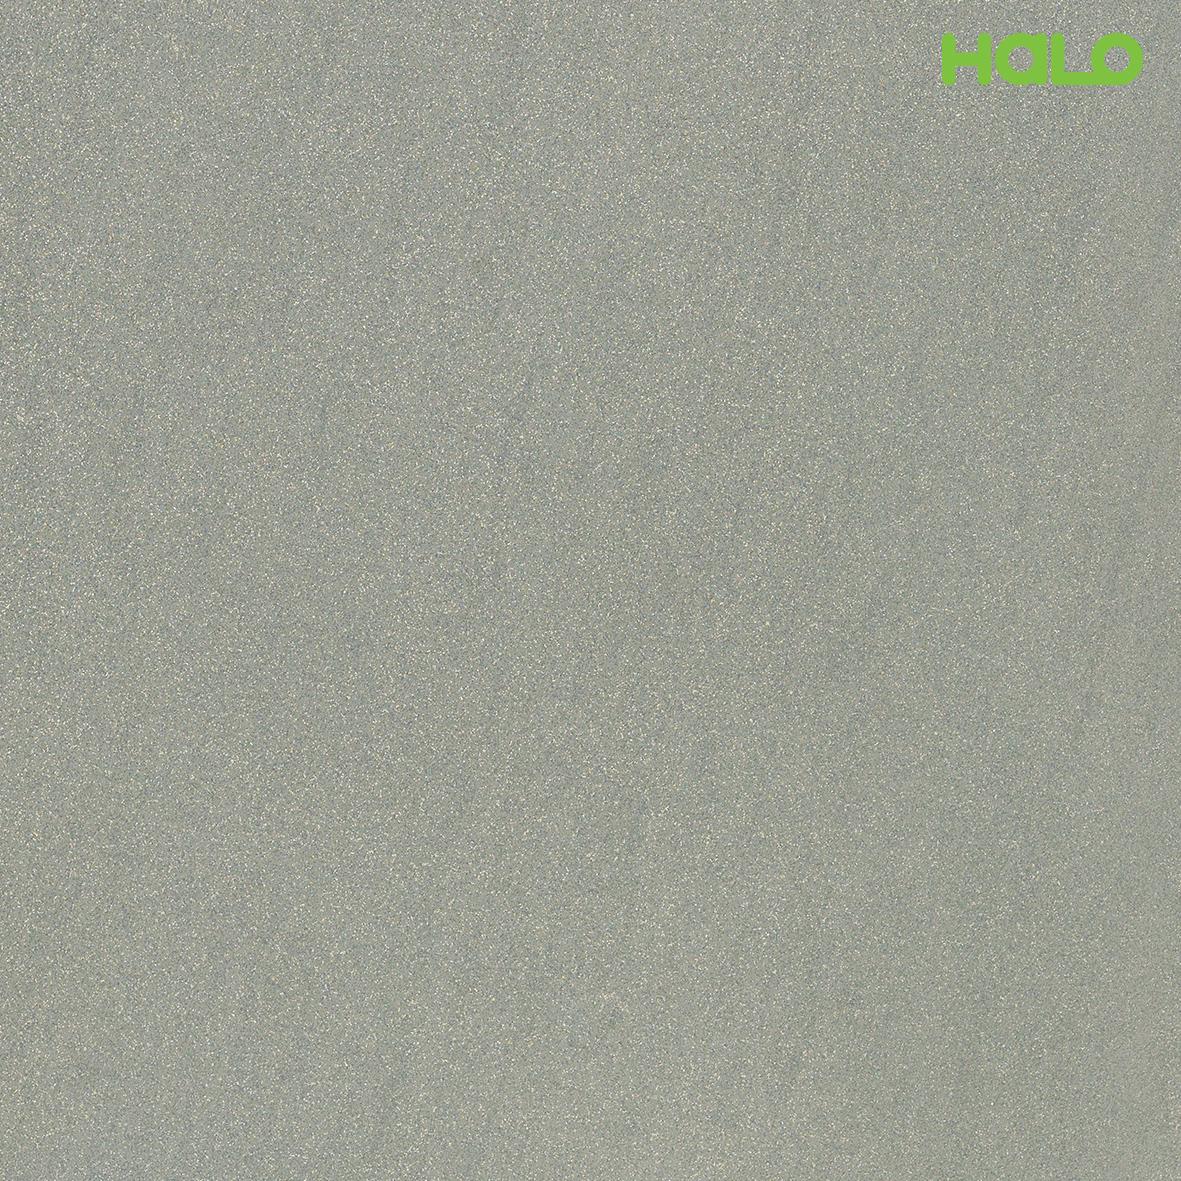 Gạch mờ - TH66A3